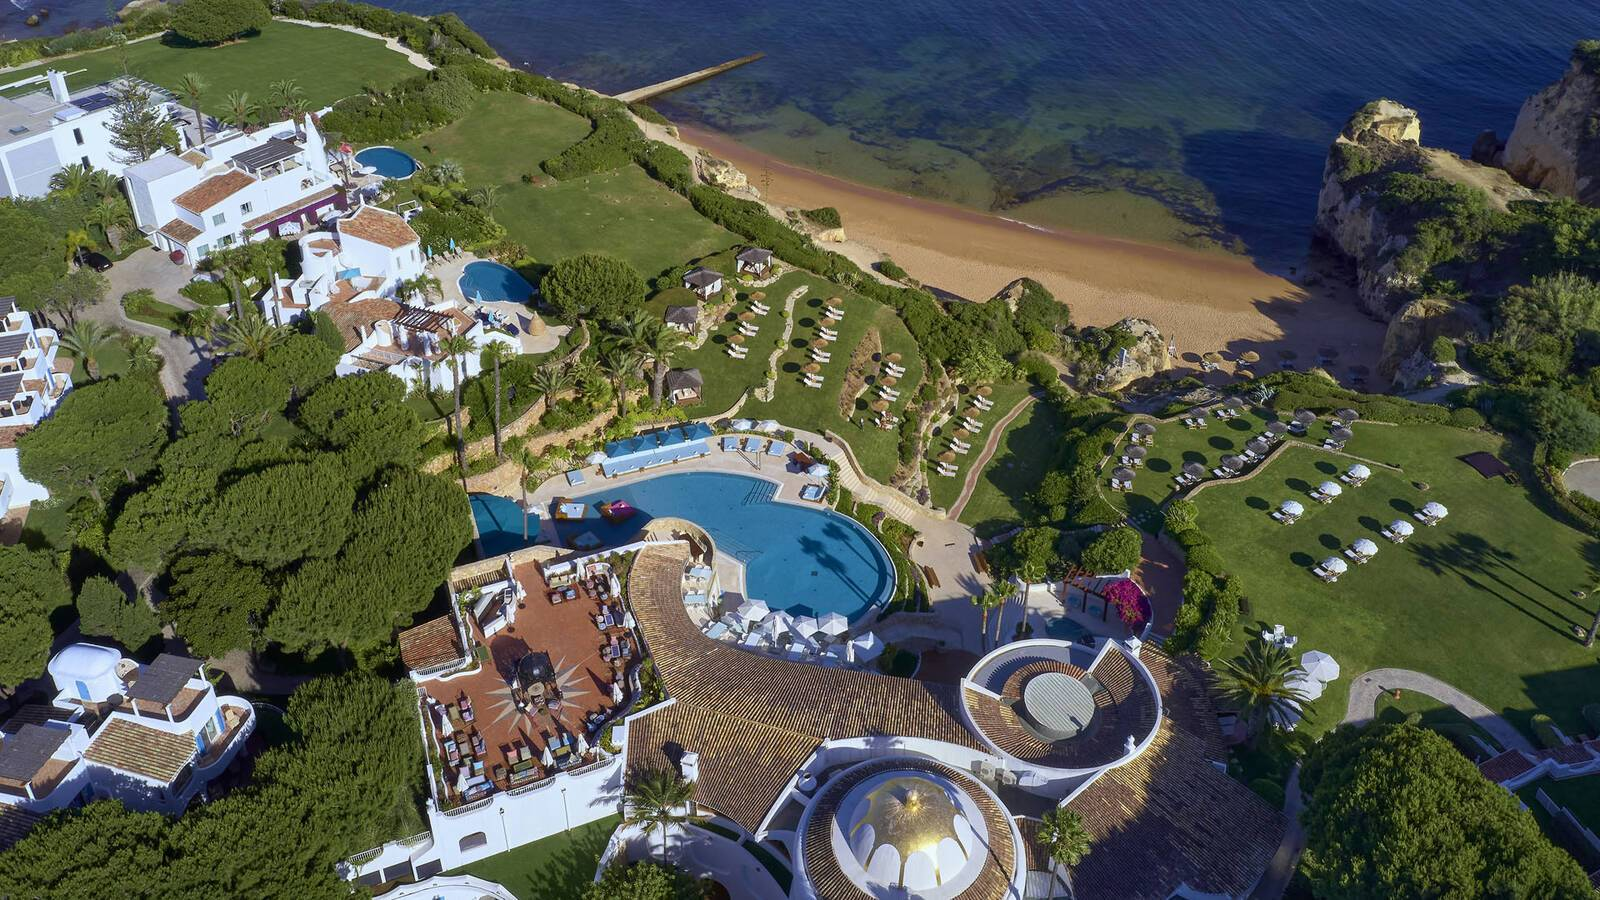 Vila Vita Parc Algarve Portugal Vue